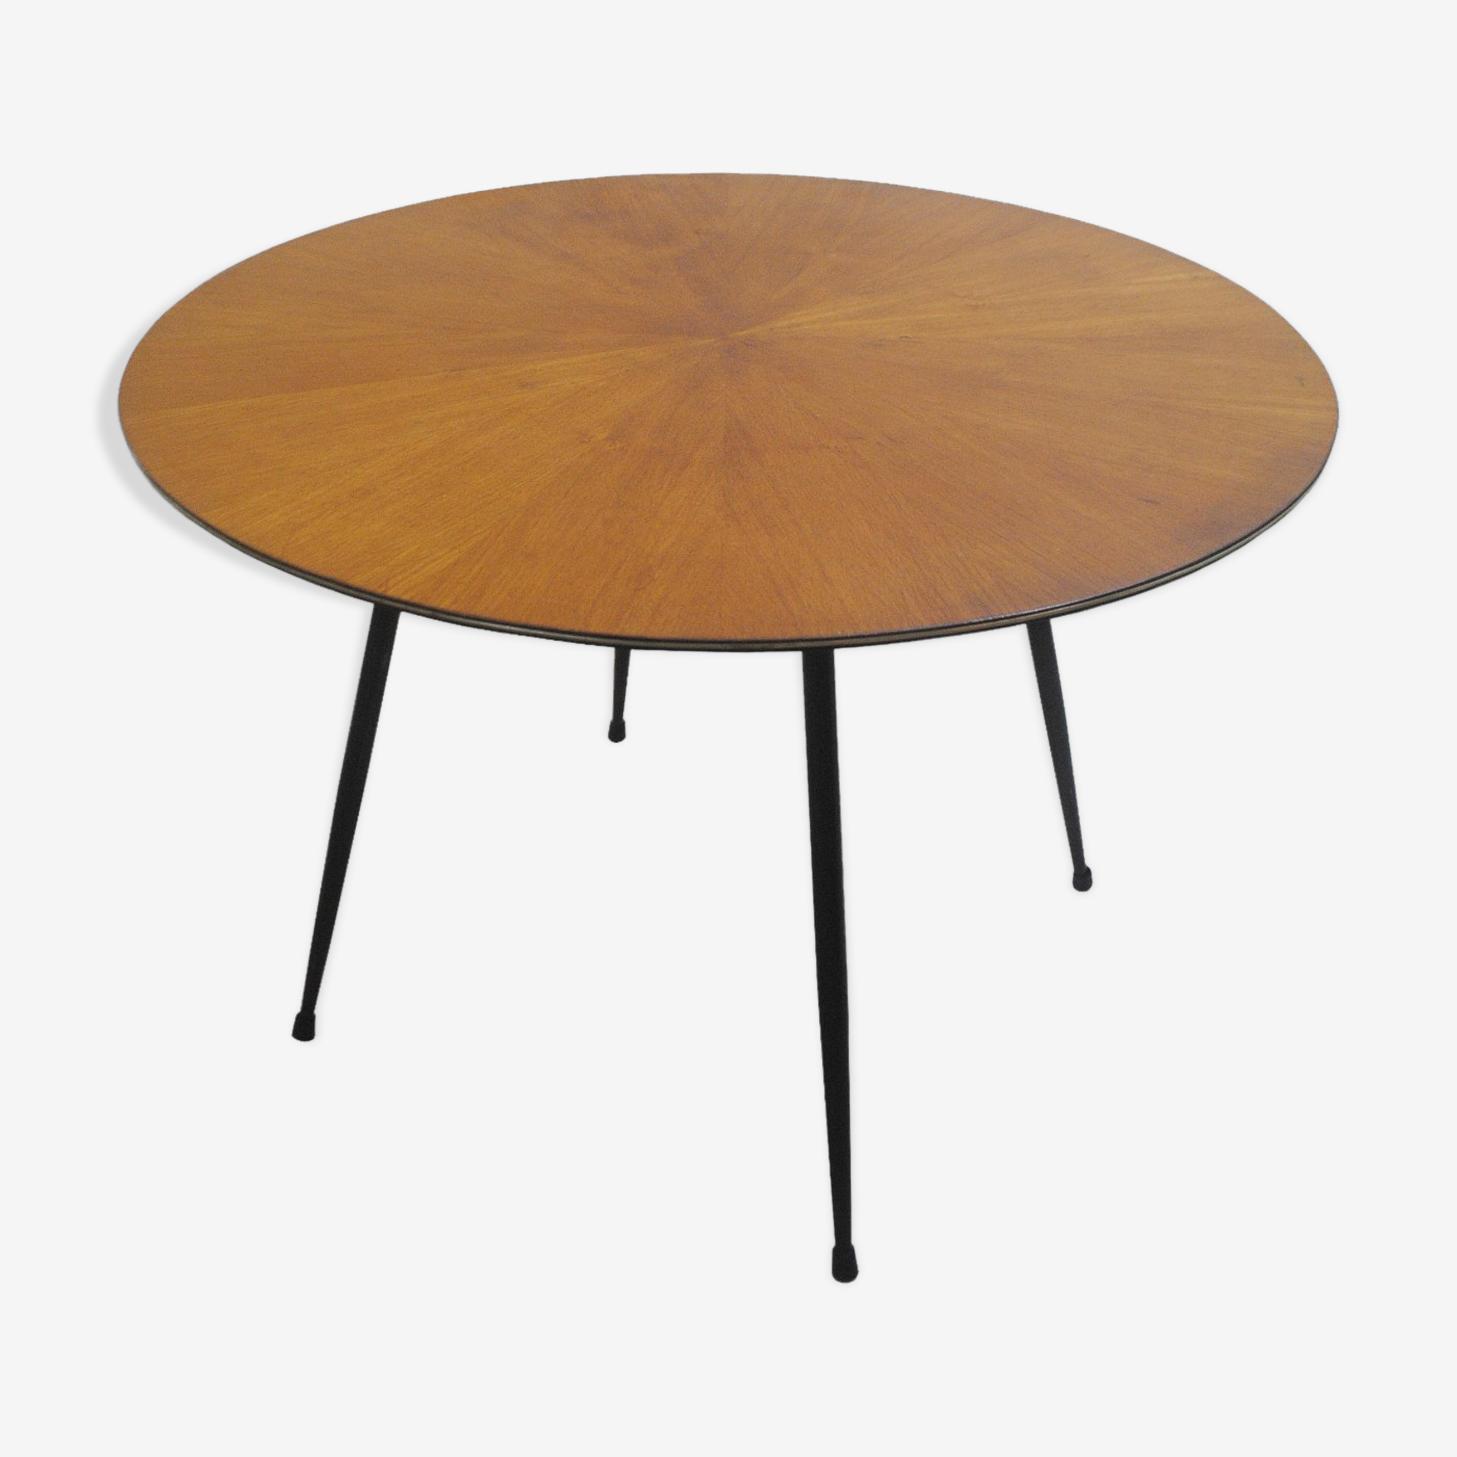 Table Vittorio Nobili, Italy, 1950